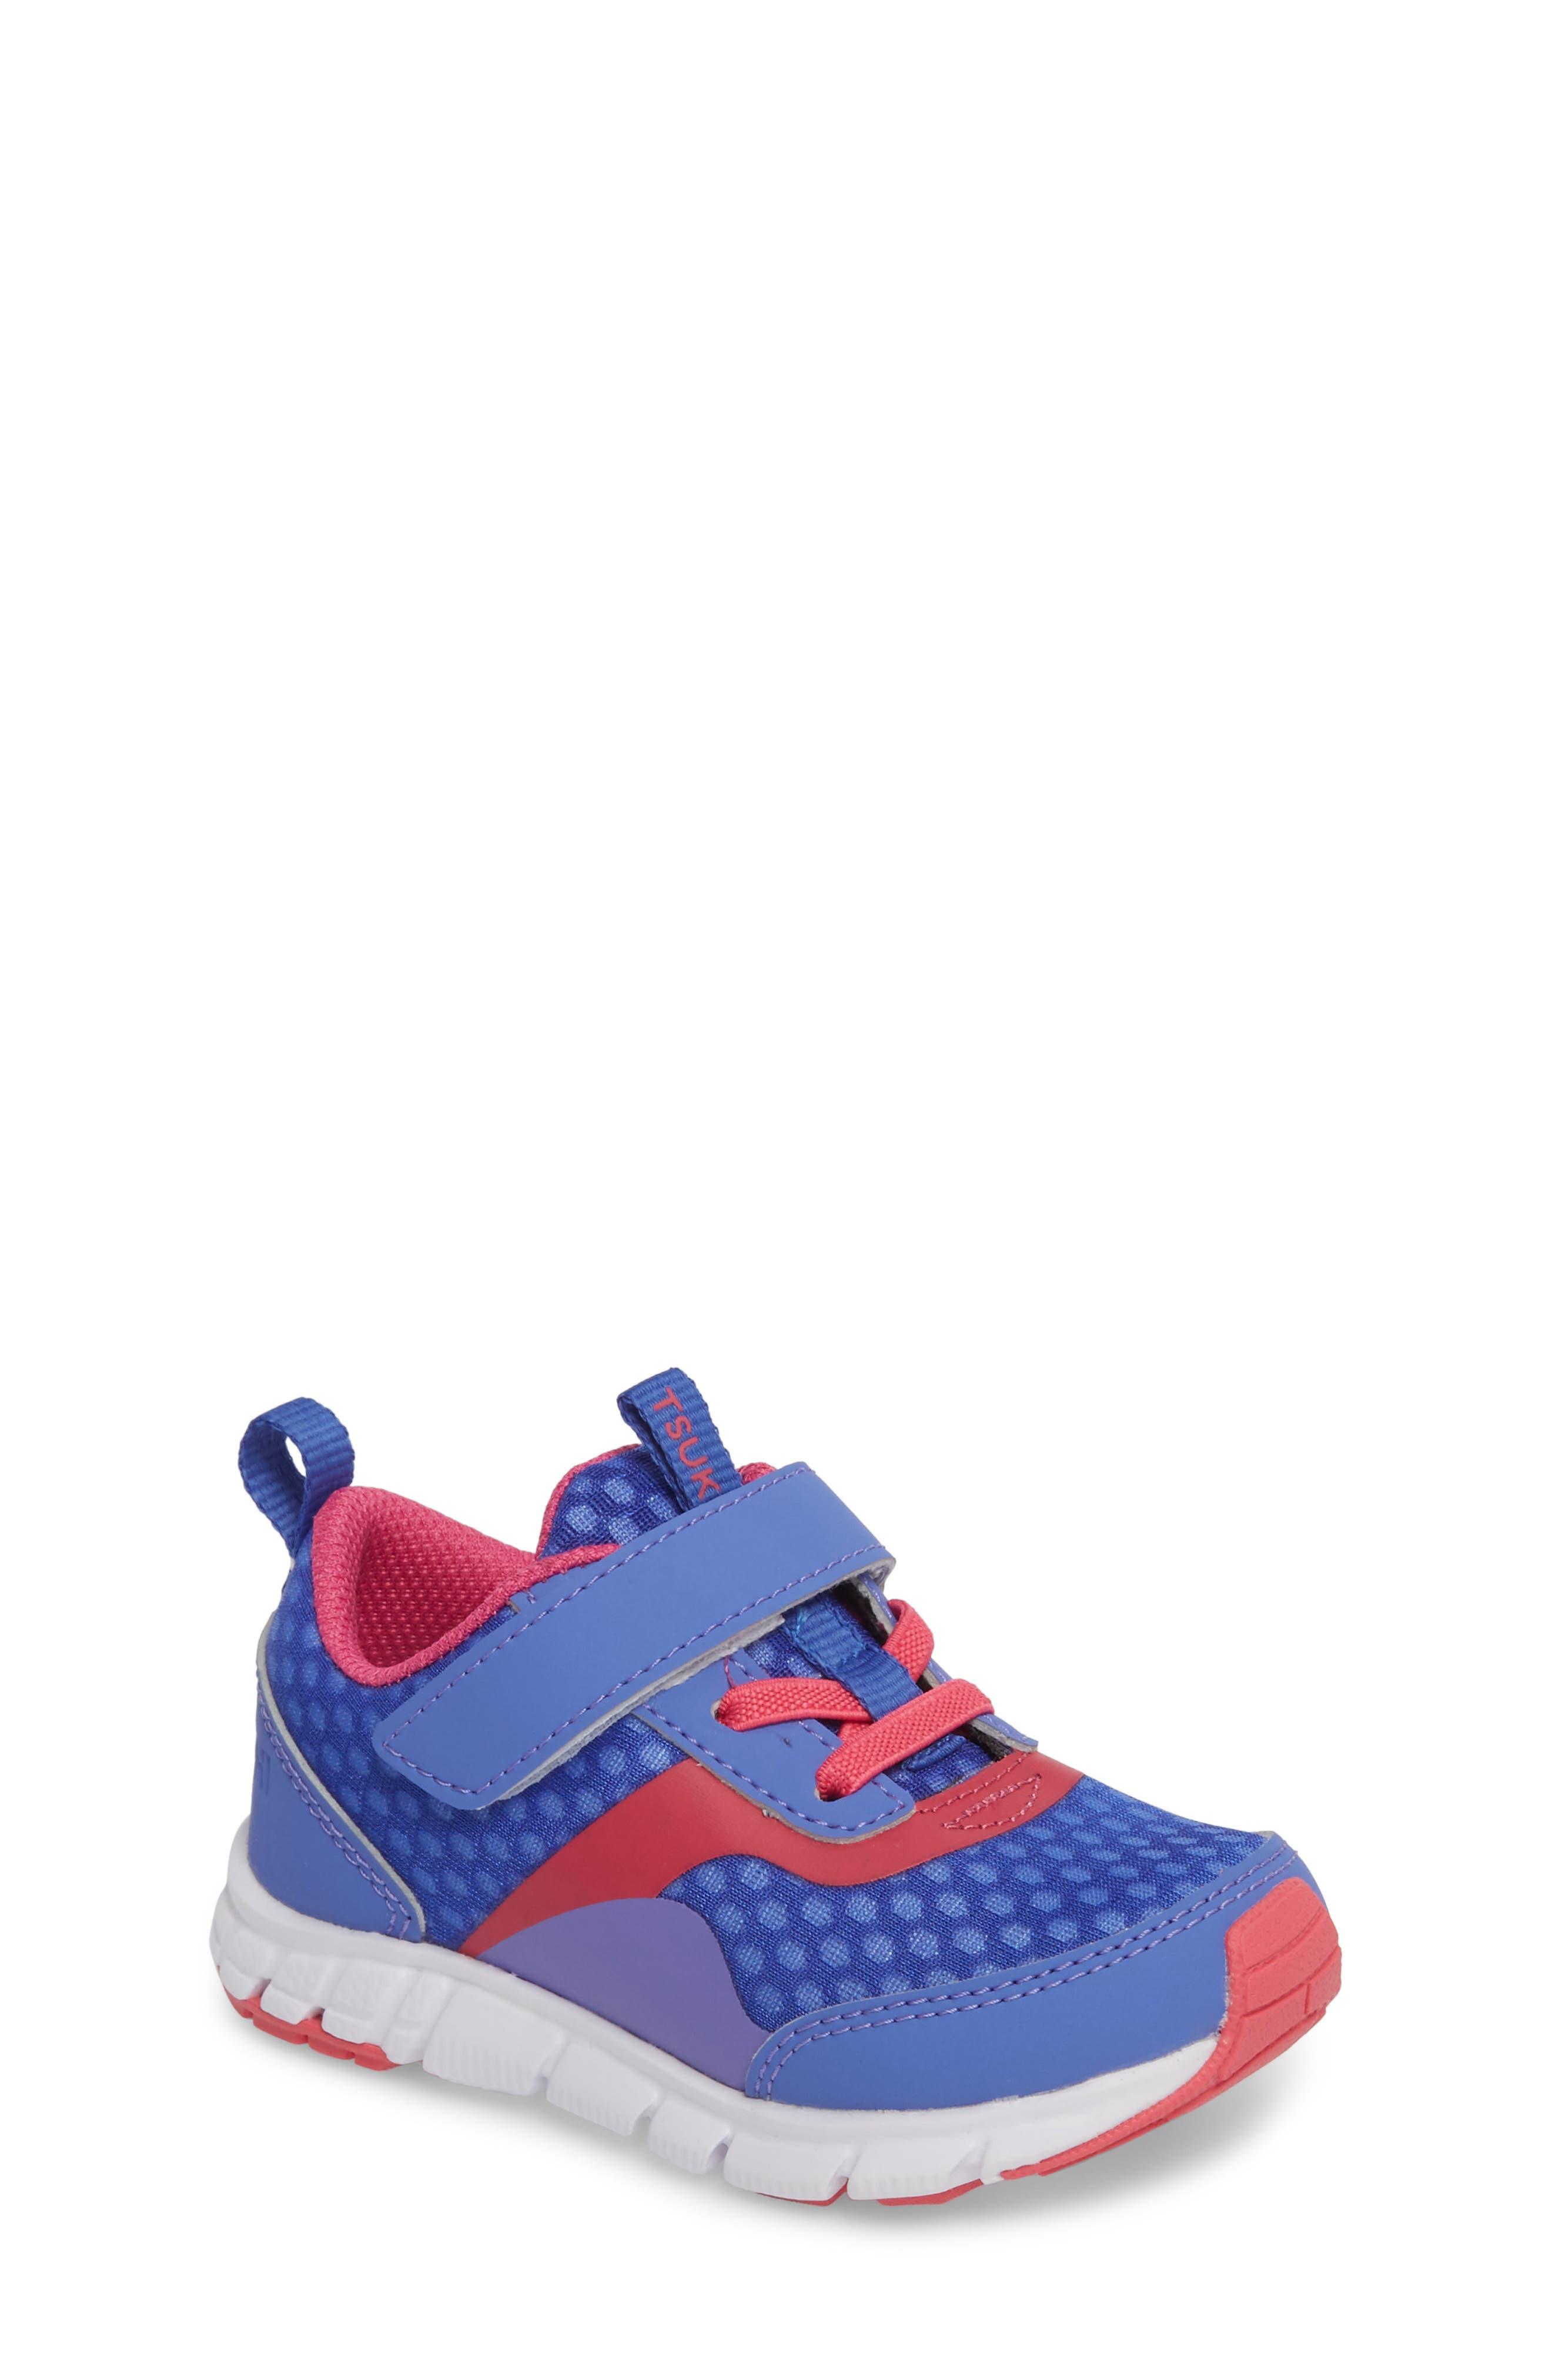 Tsukihoshi Sonic Washable Sneaker (Walker, Toddler, Little Kid & Big Kid)